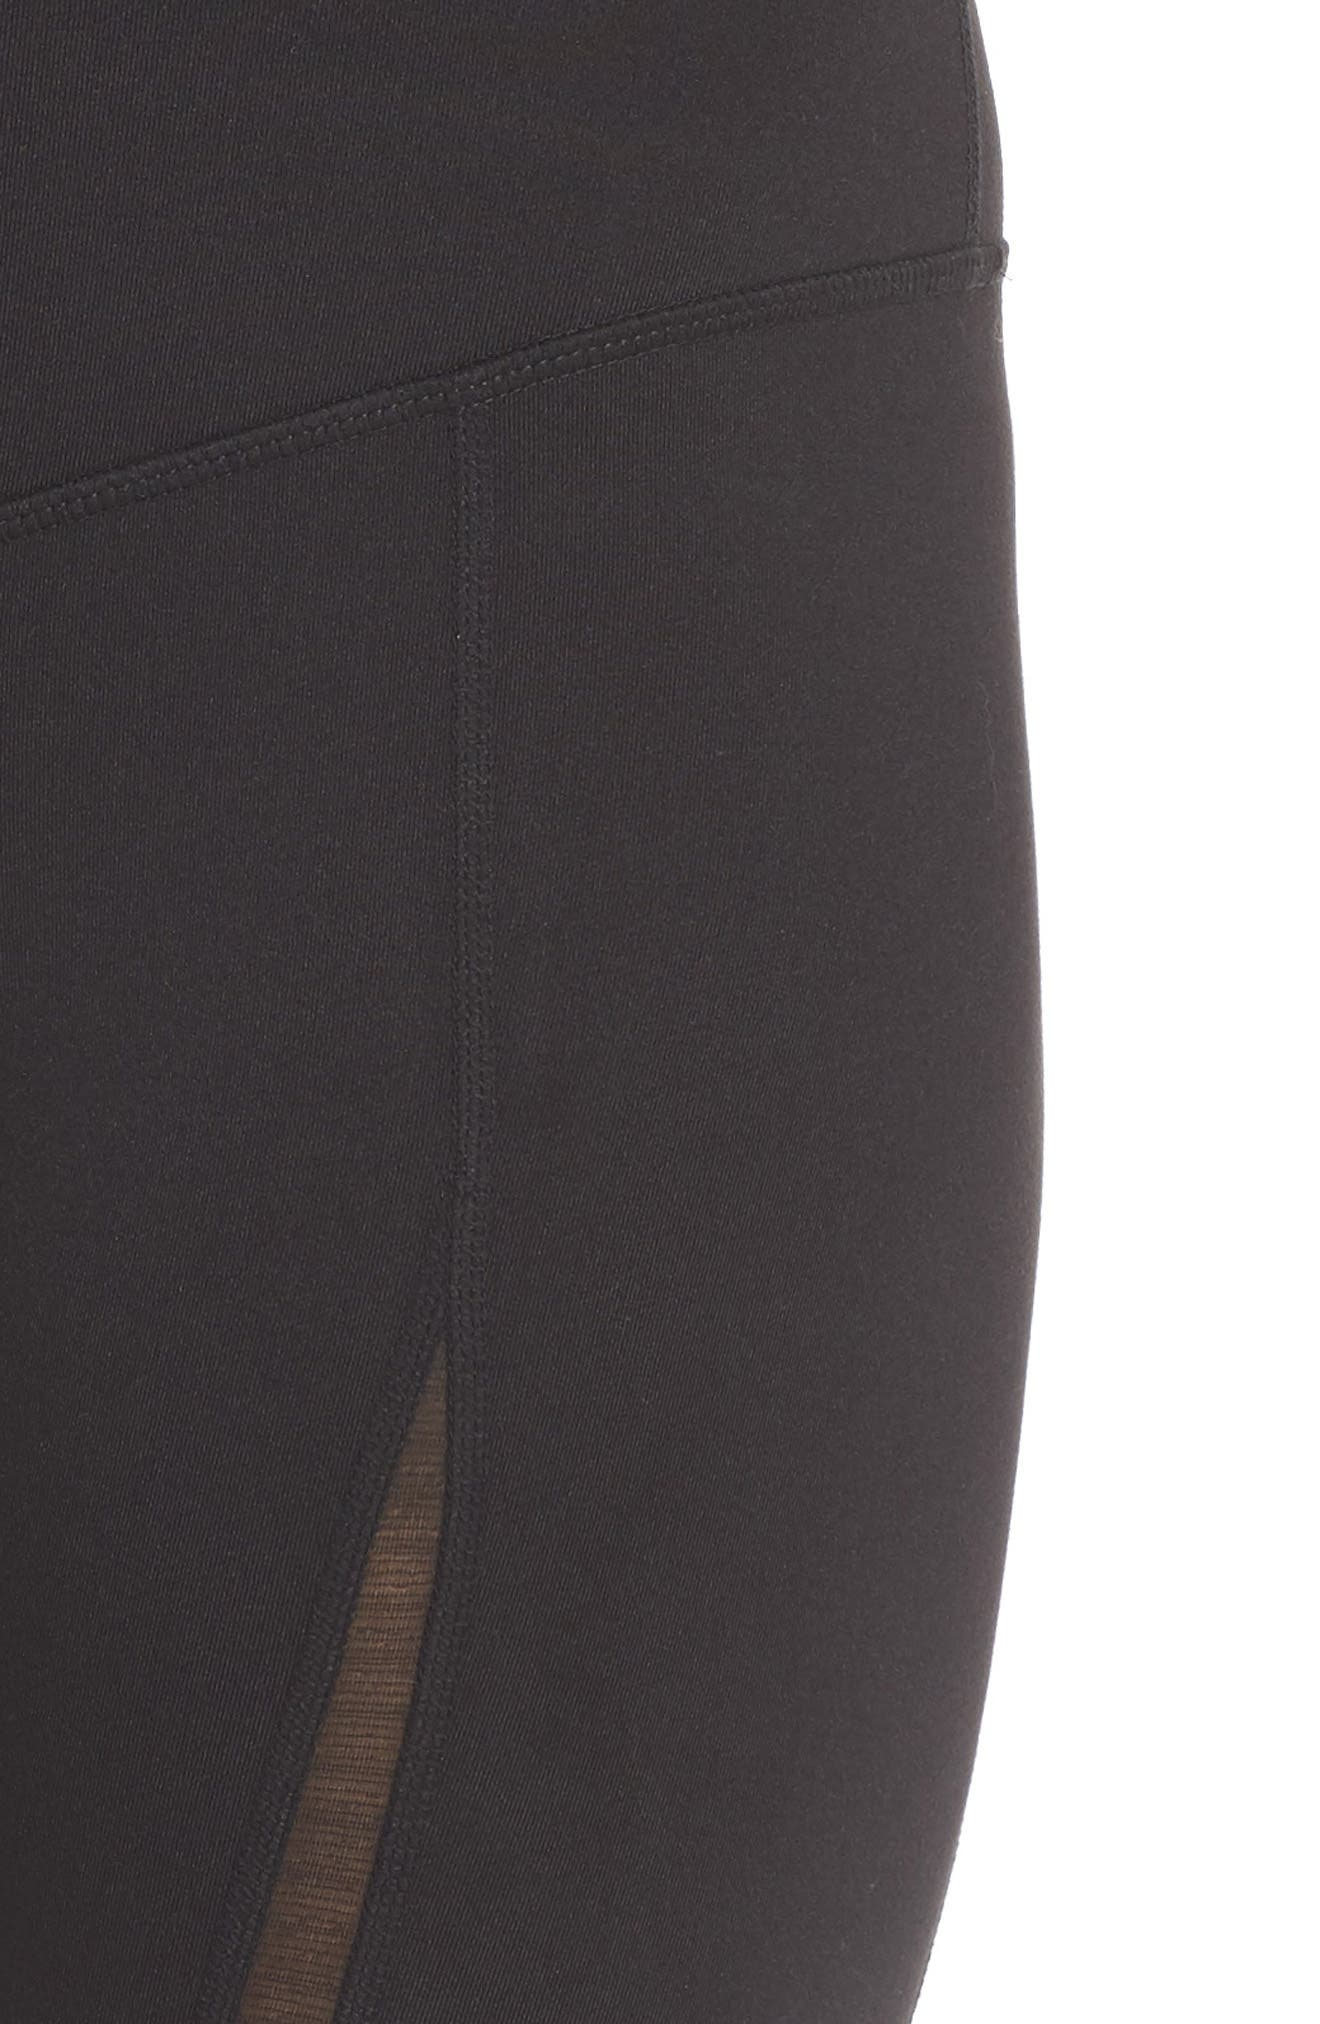 Reinvent Recycled High Waist Leggings,                             Alternate thumbnail 4, color,                             BLACK